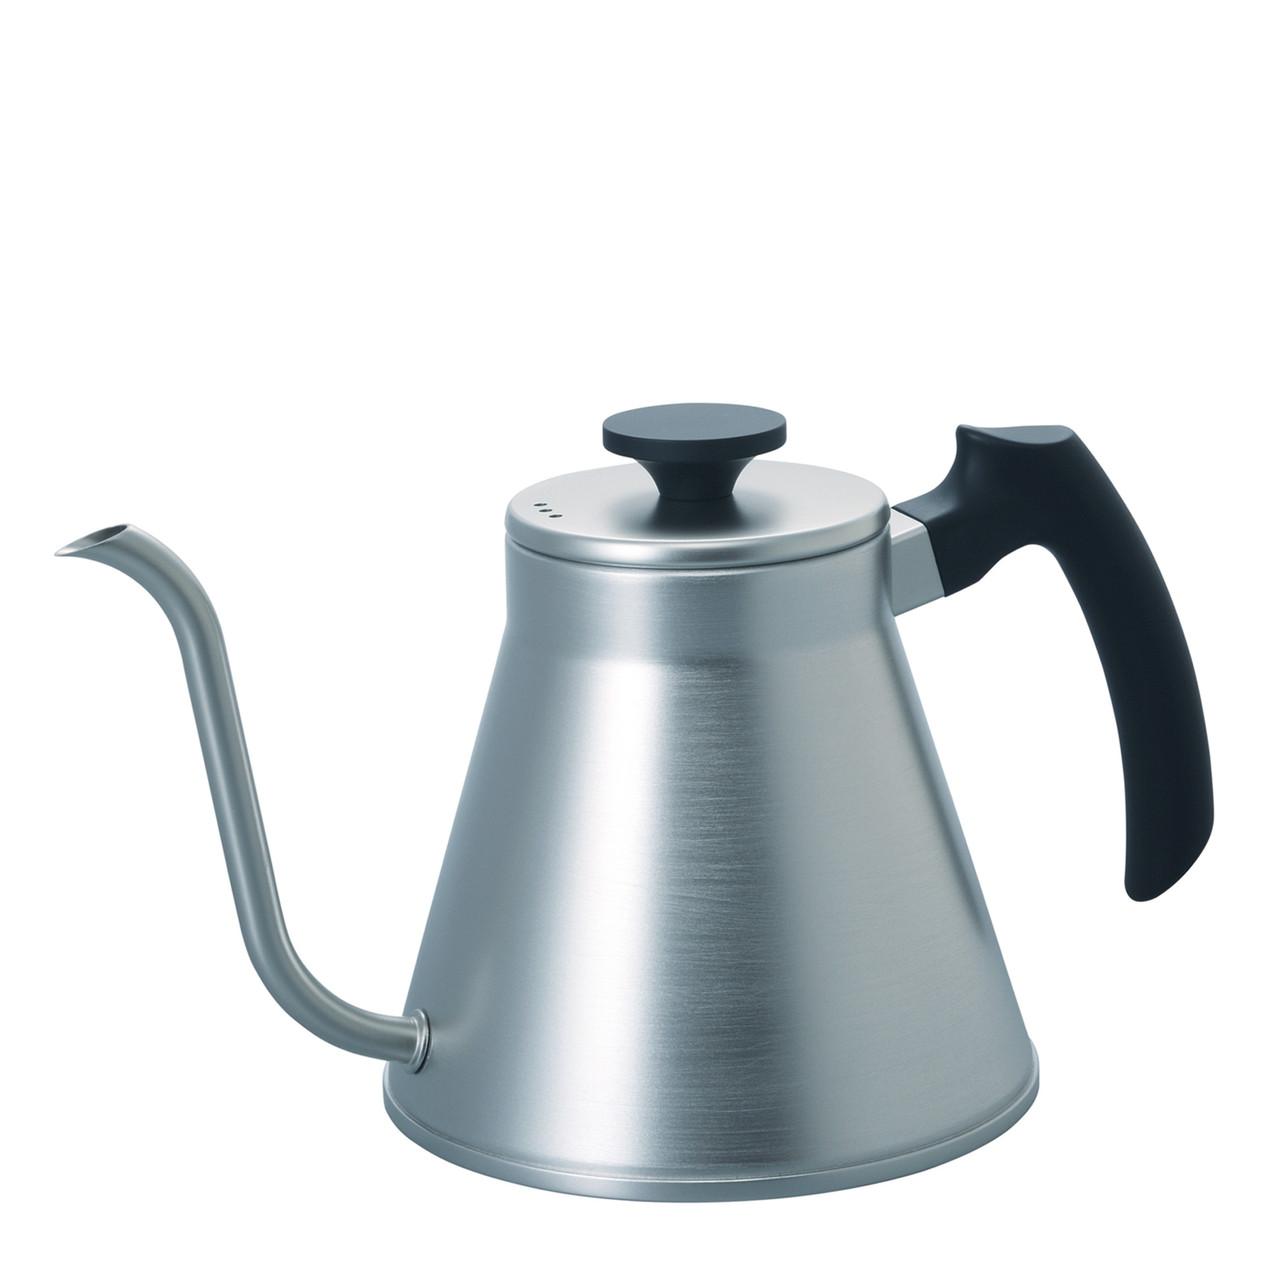 Чайник для заваривания кофе Hario V60 Drip Kit  (1,2 л)